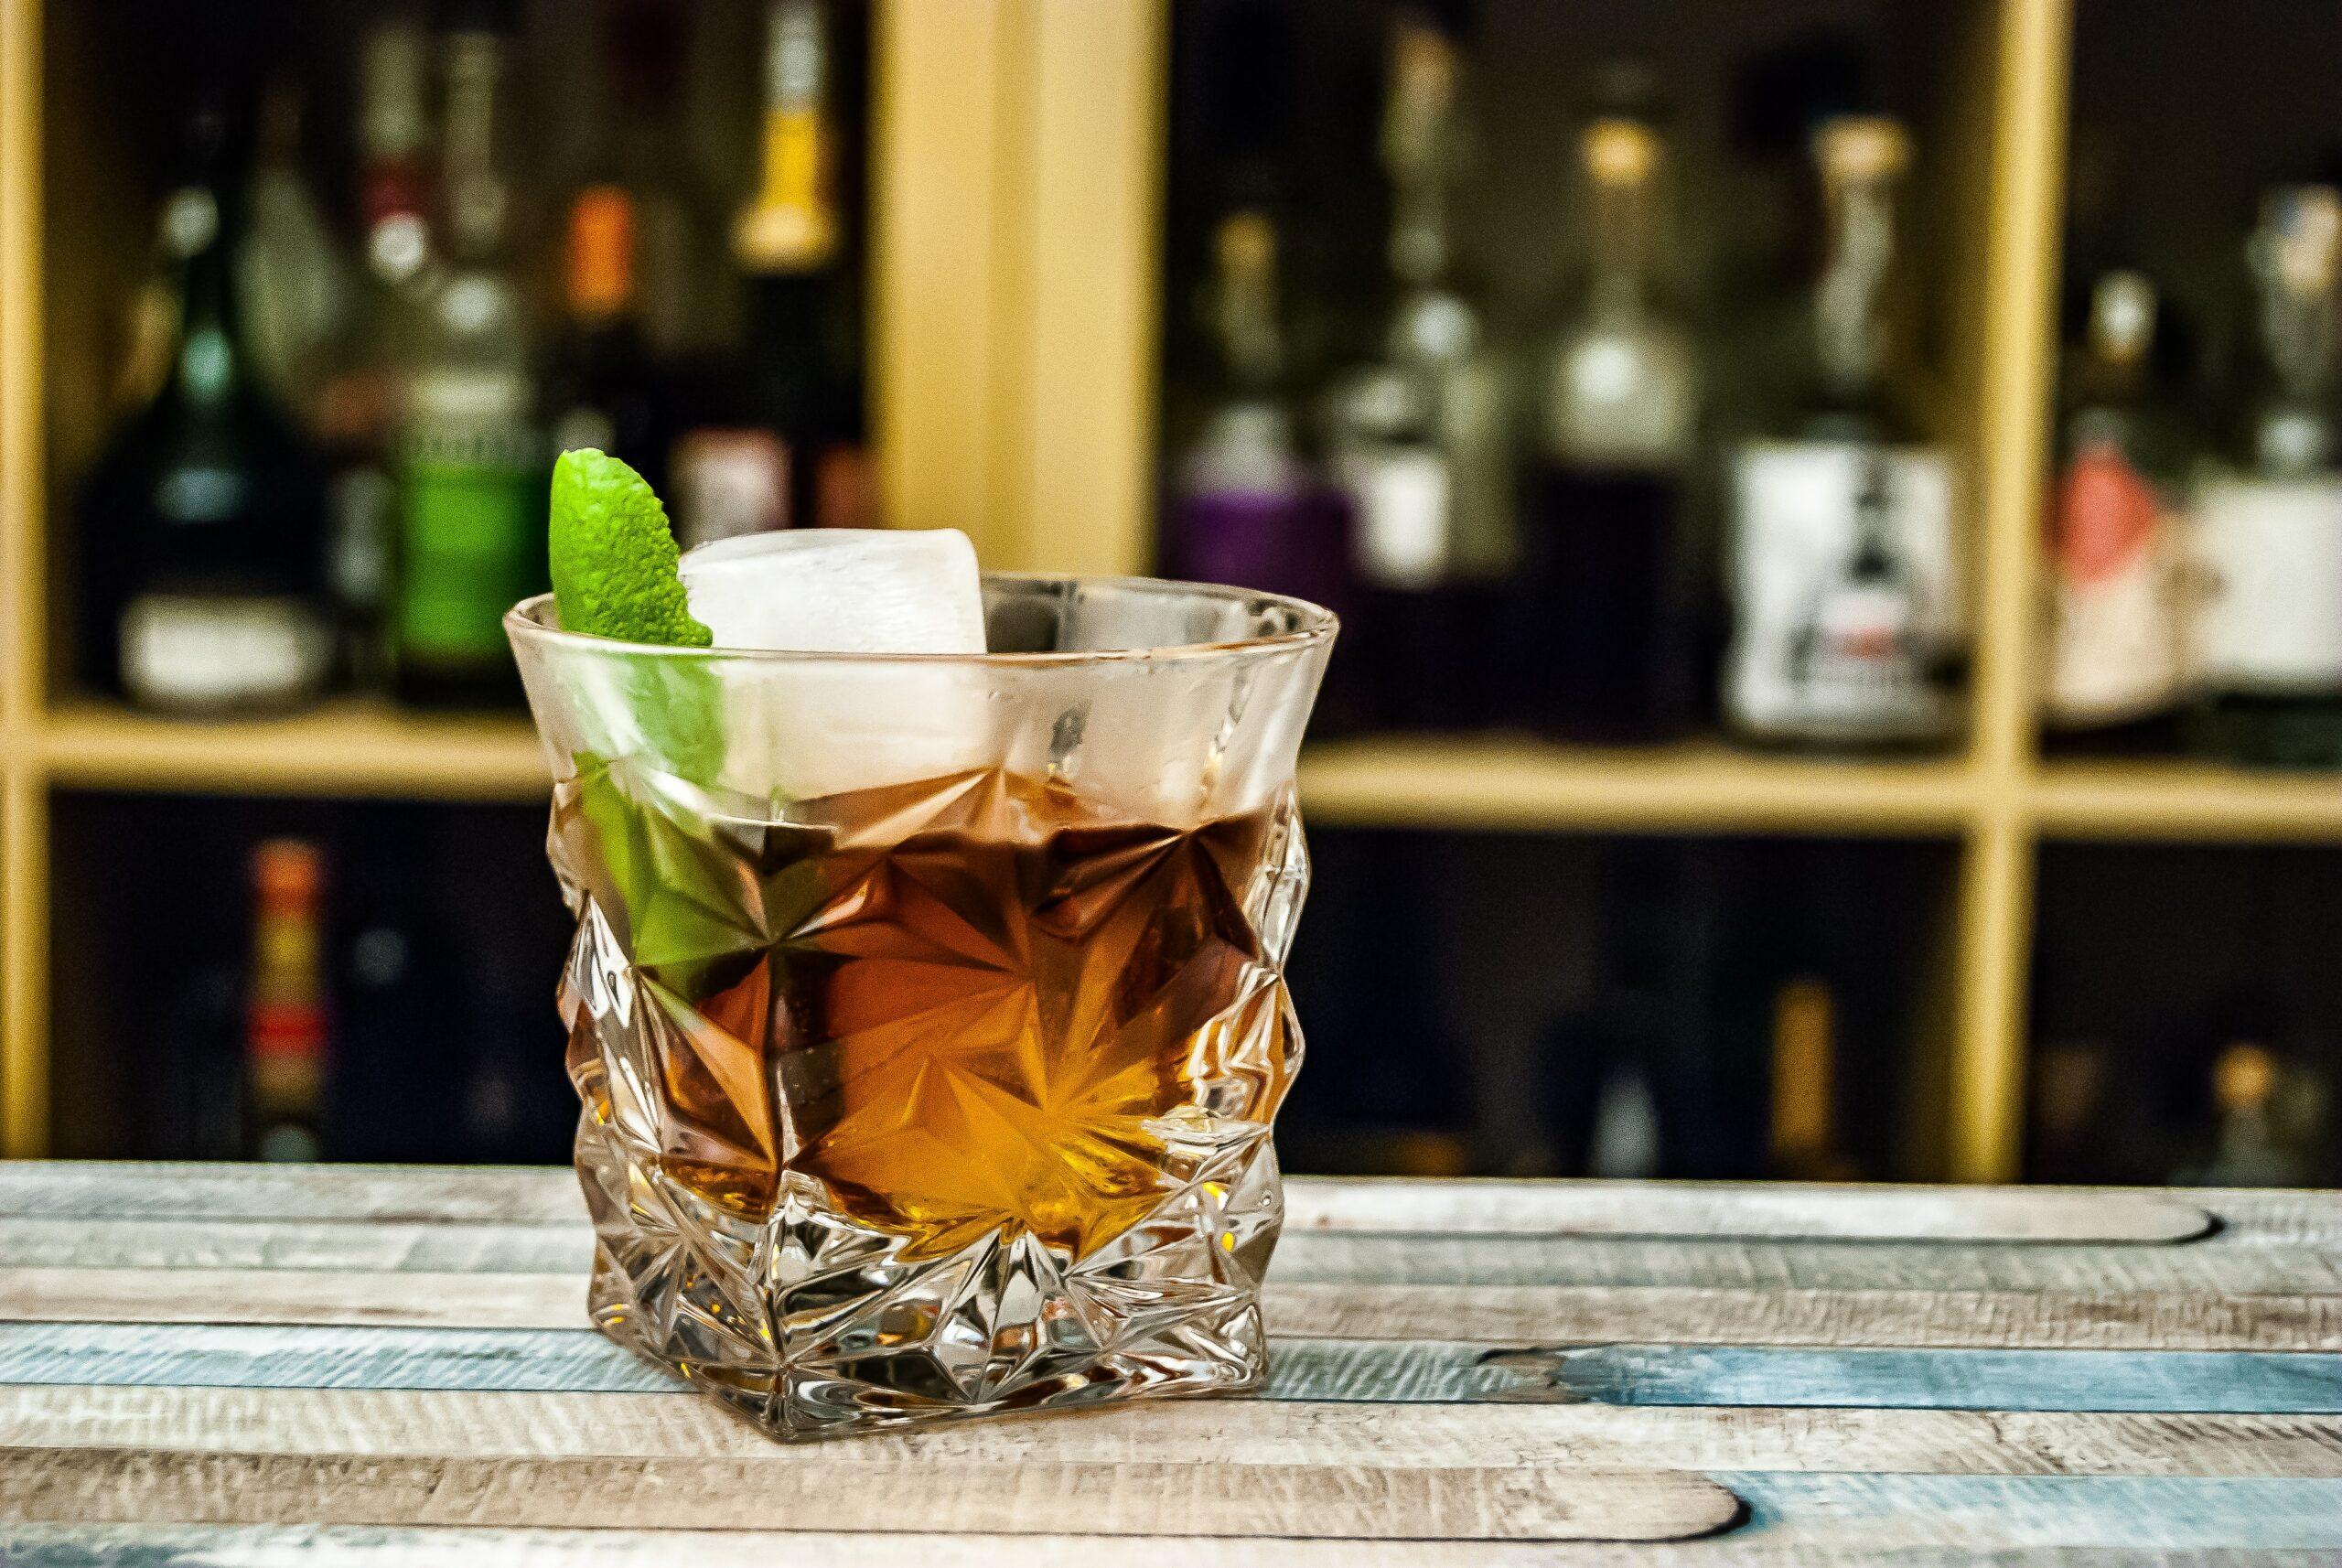 Wine beer whiskey California Covid-19